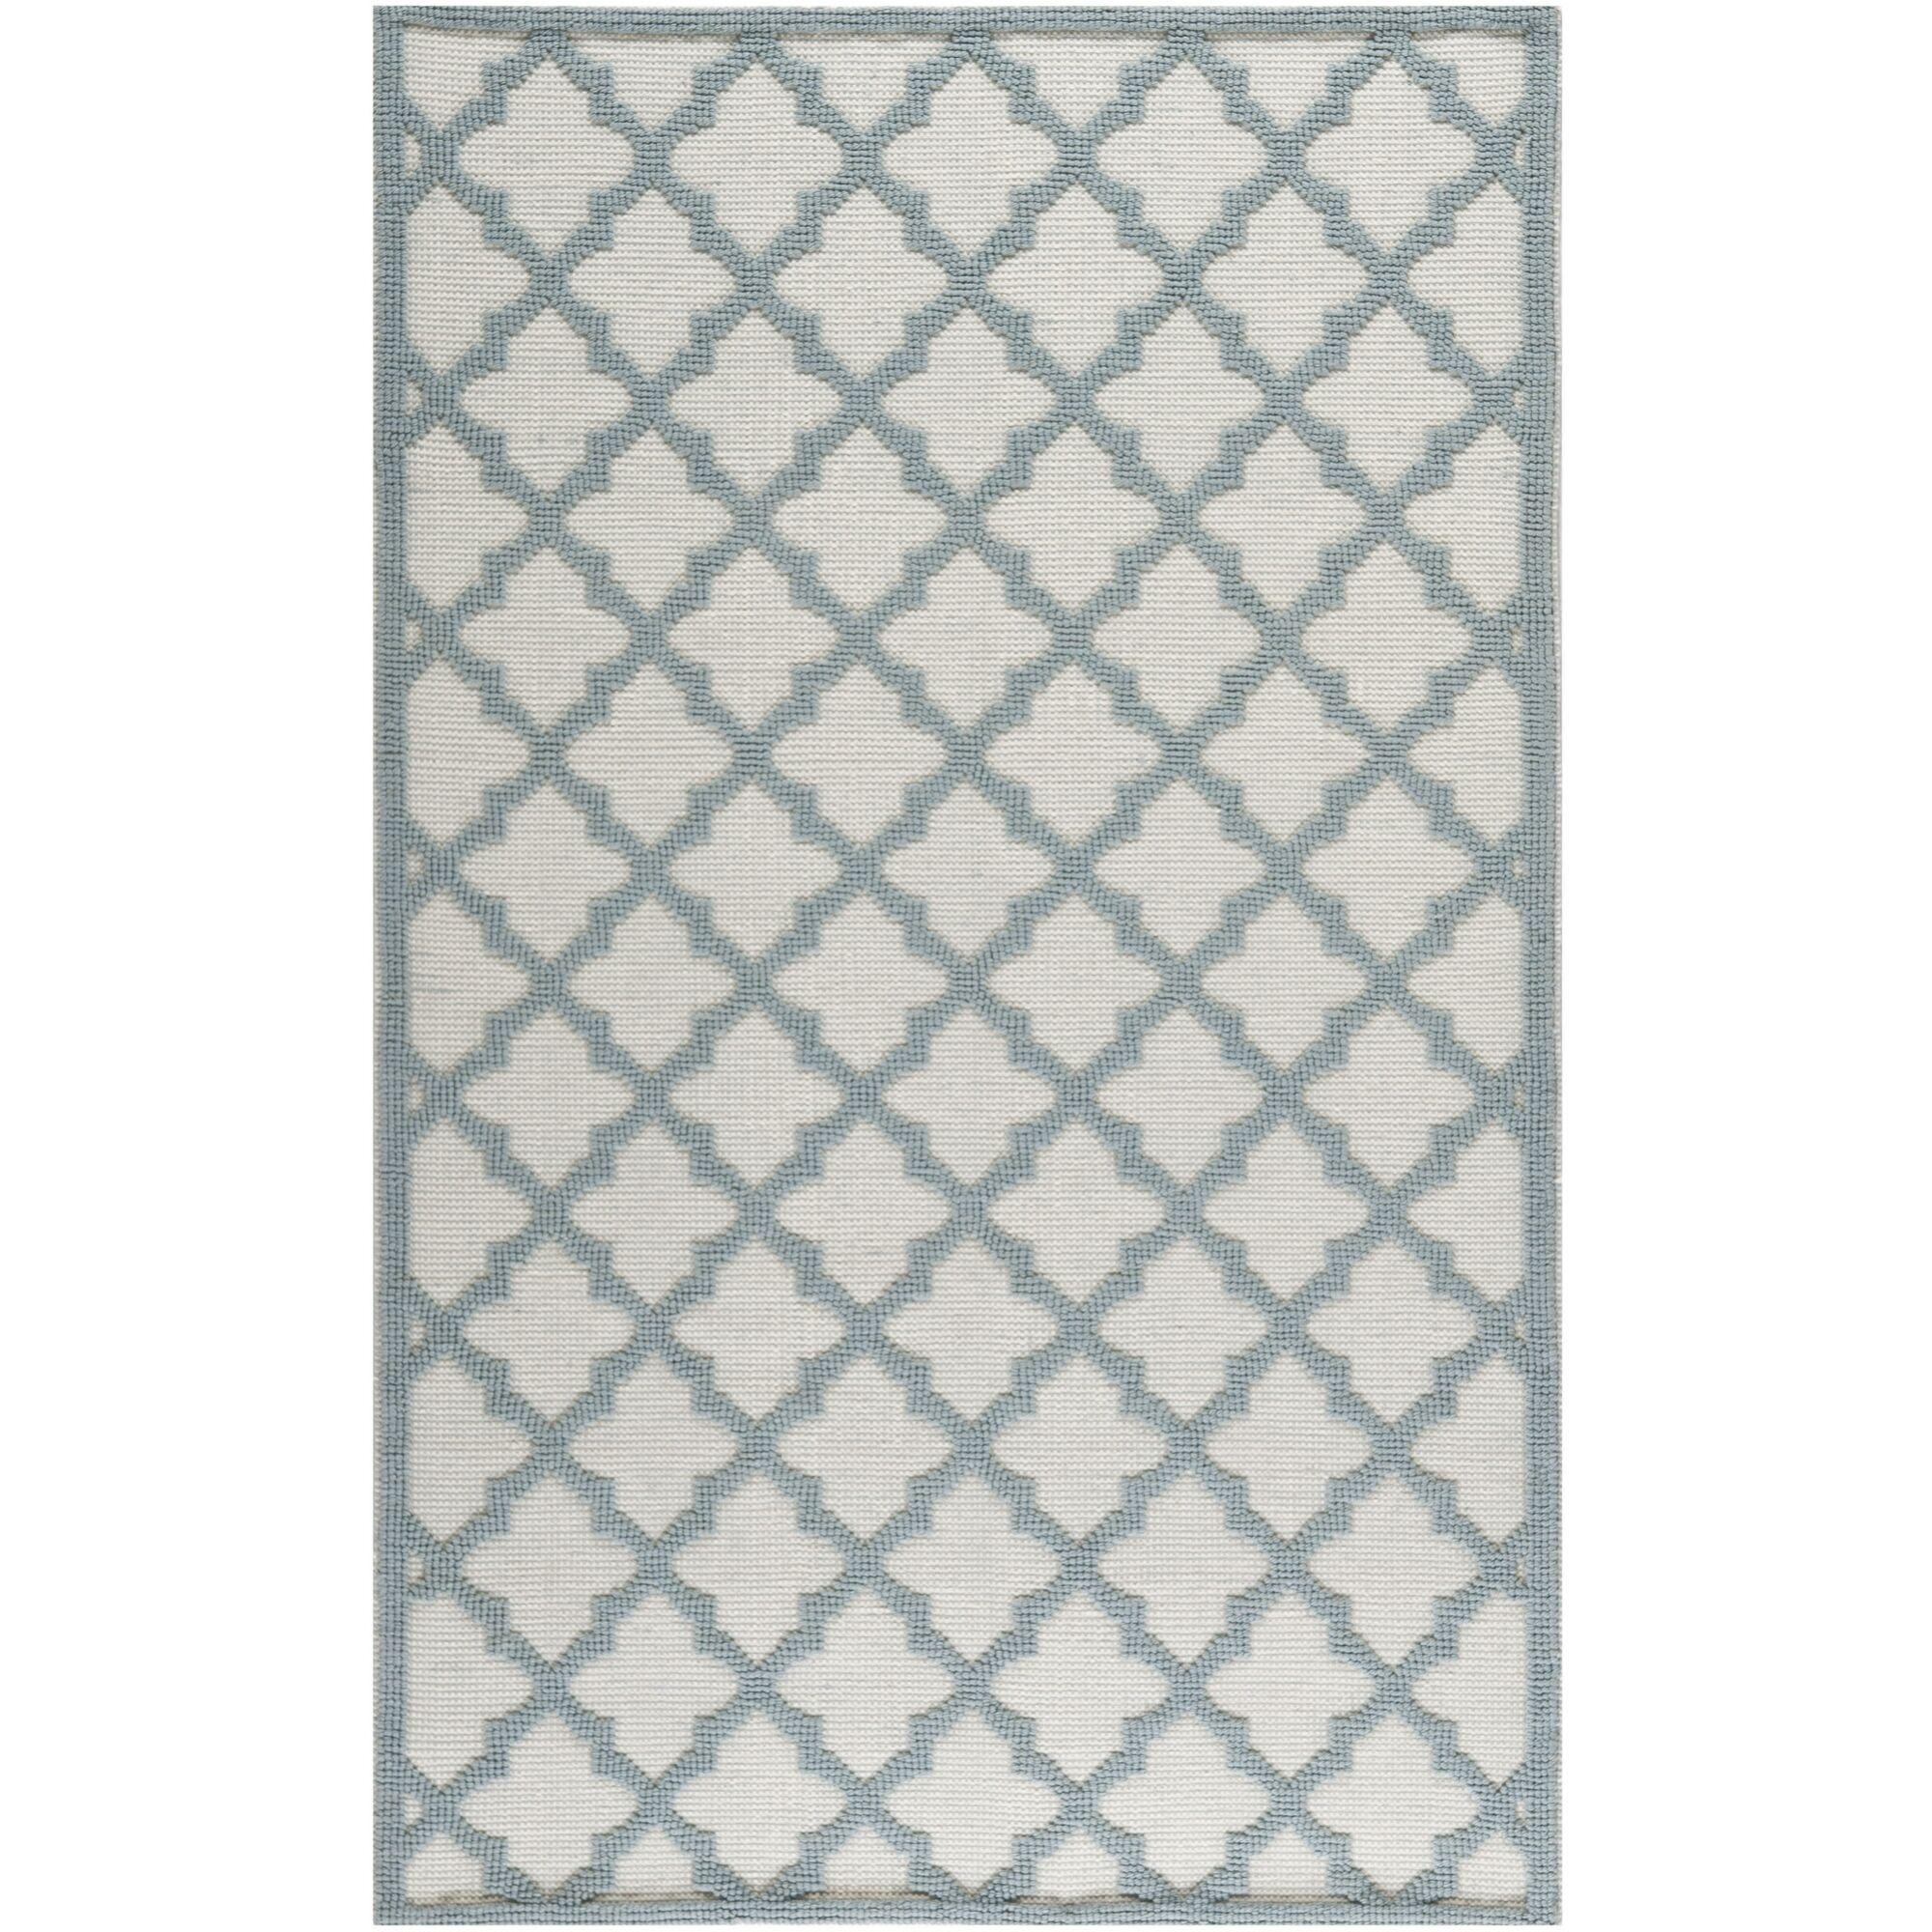 Martha Stewart Puzzle Floral Ivory/Blue  Rug Rug Size: Rectangle 8' x 10'